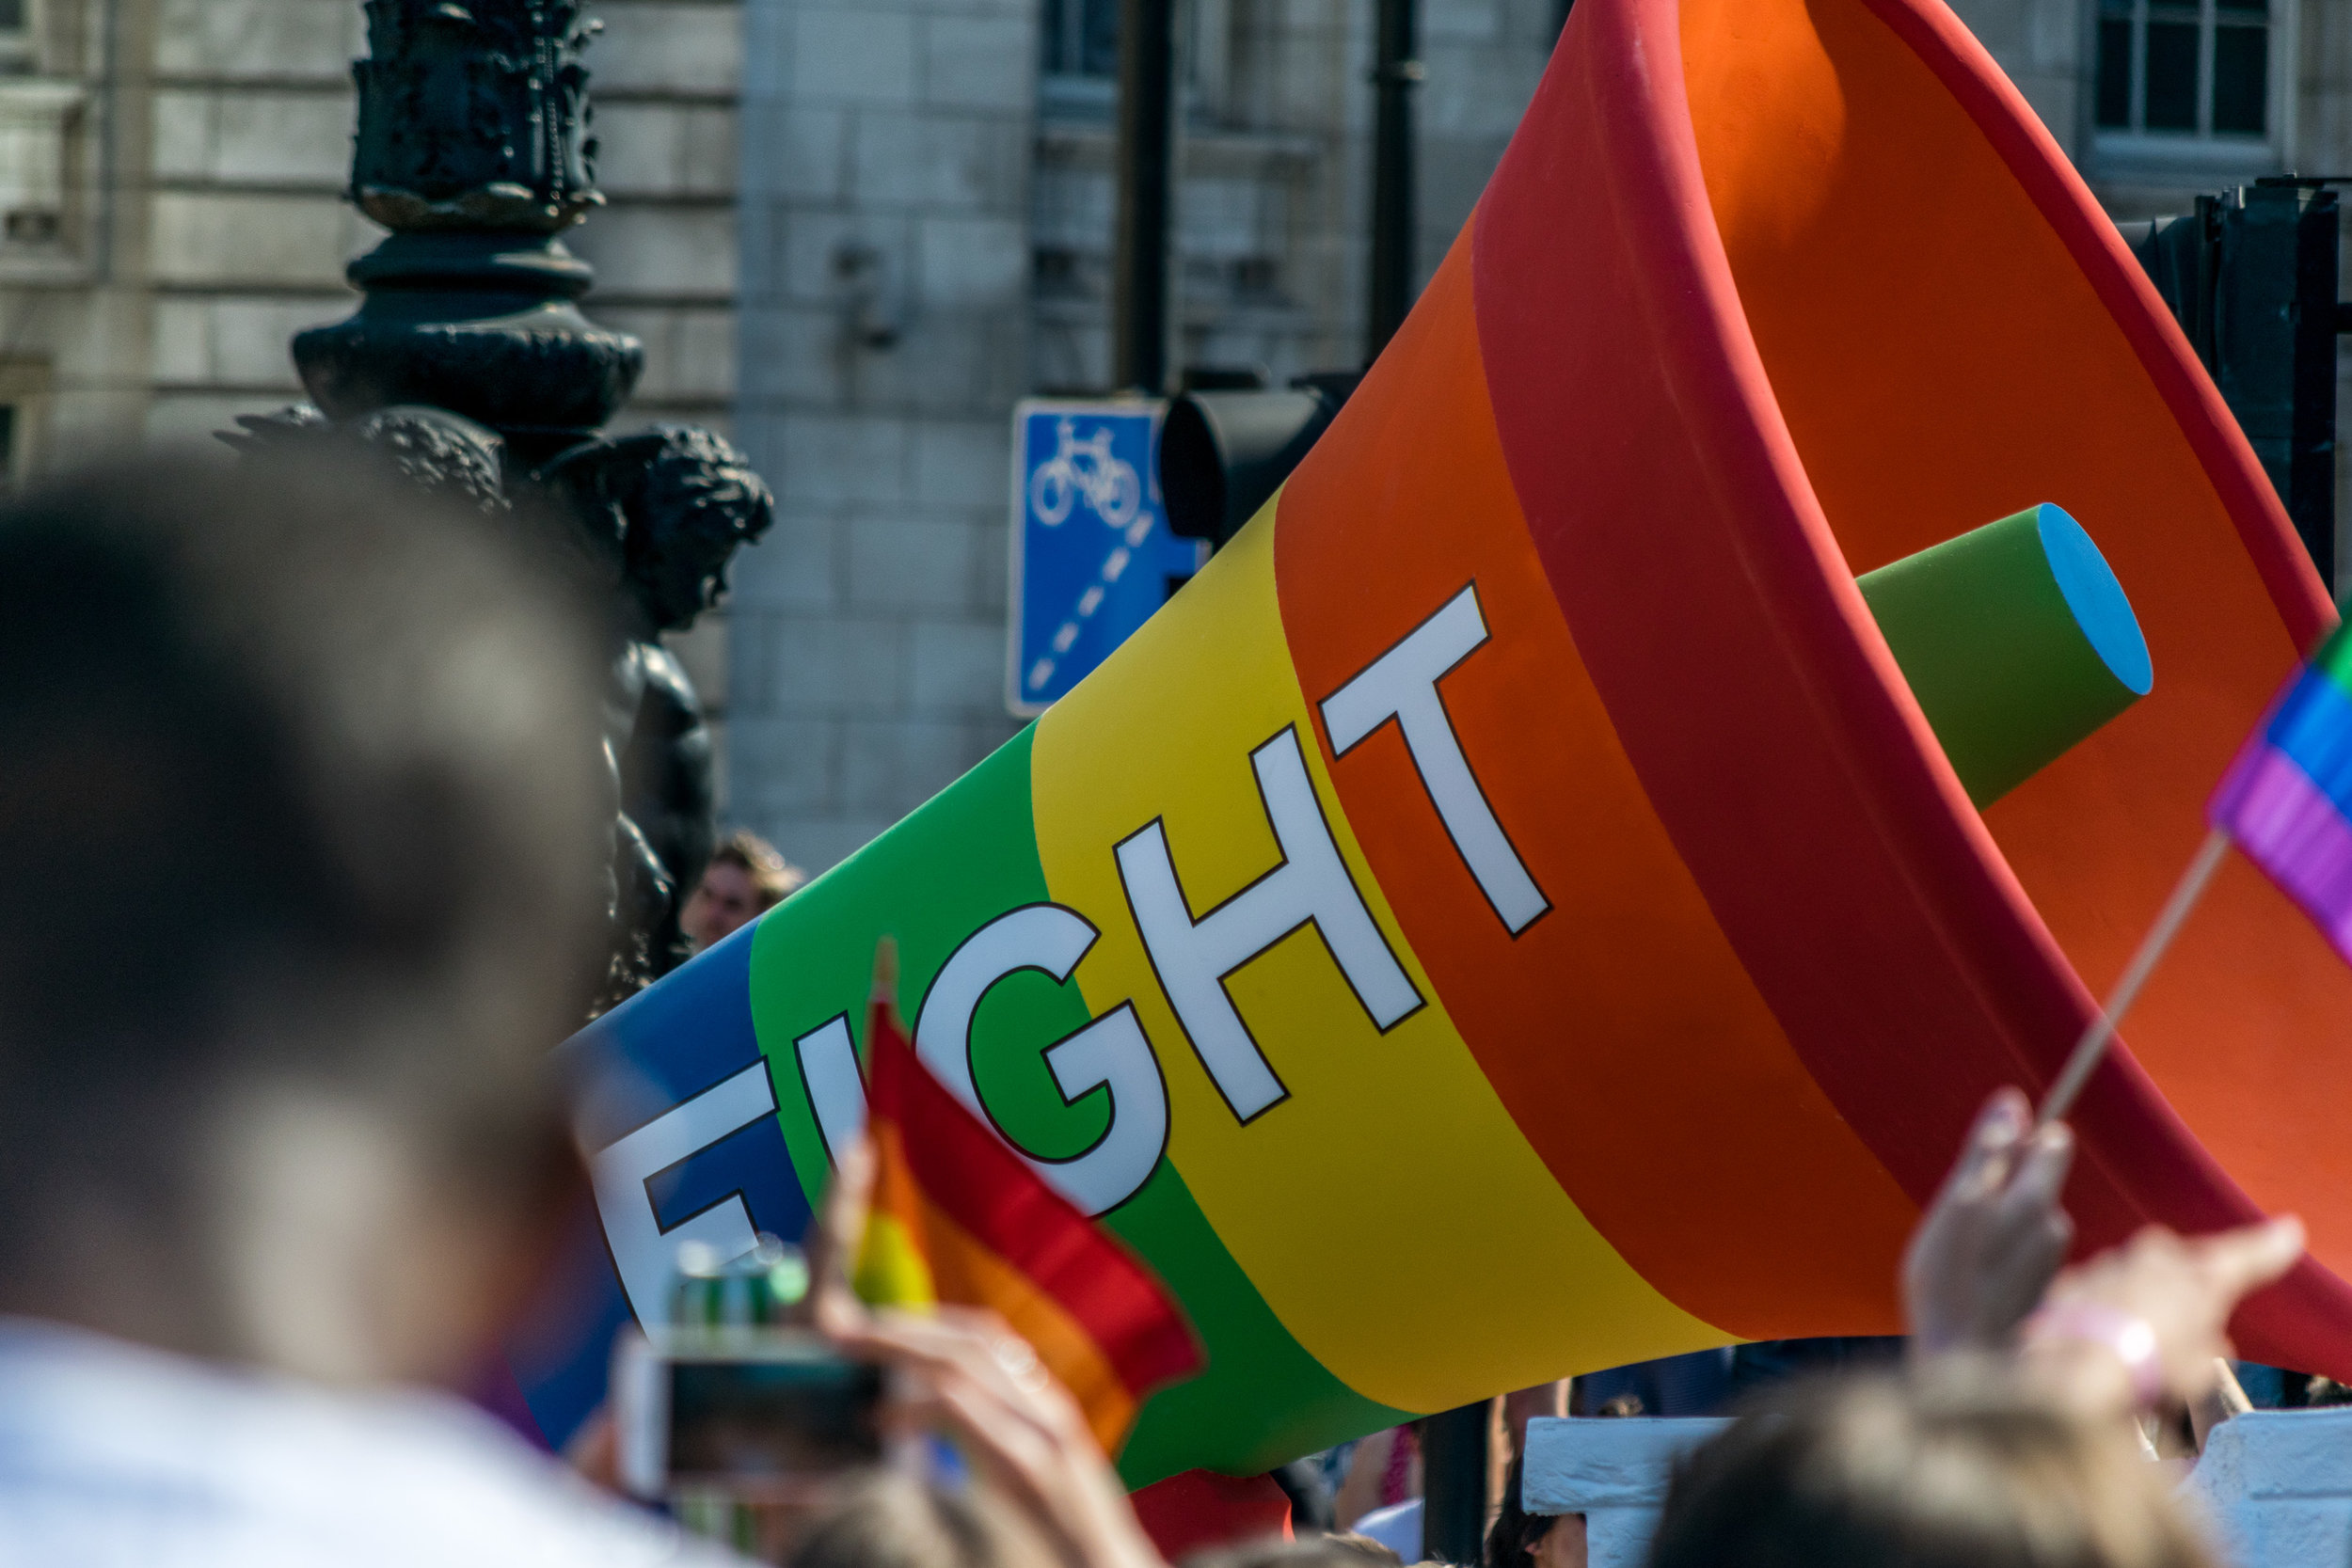 PrideLondon-08Jul2017-107.jpg